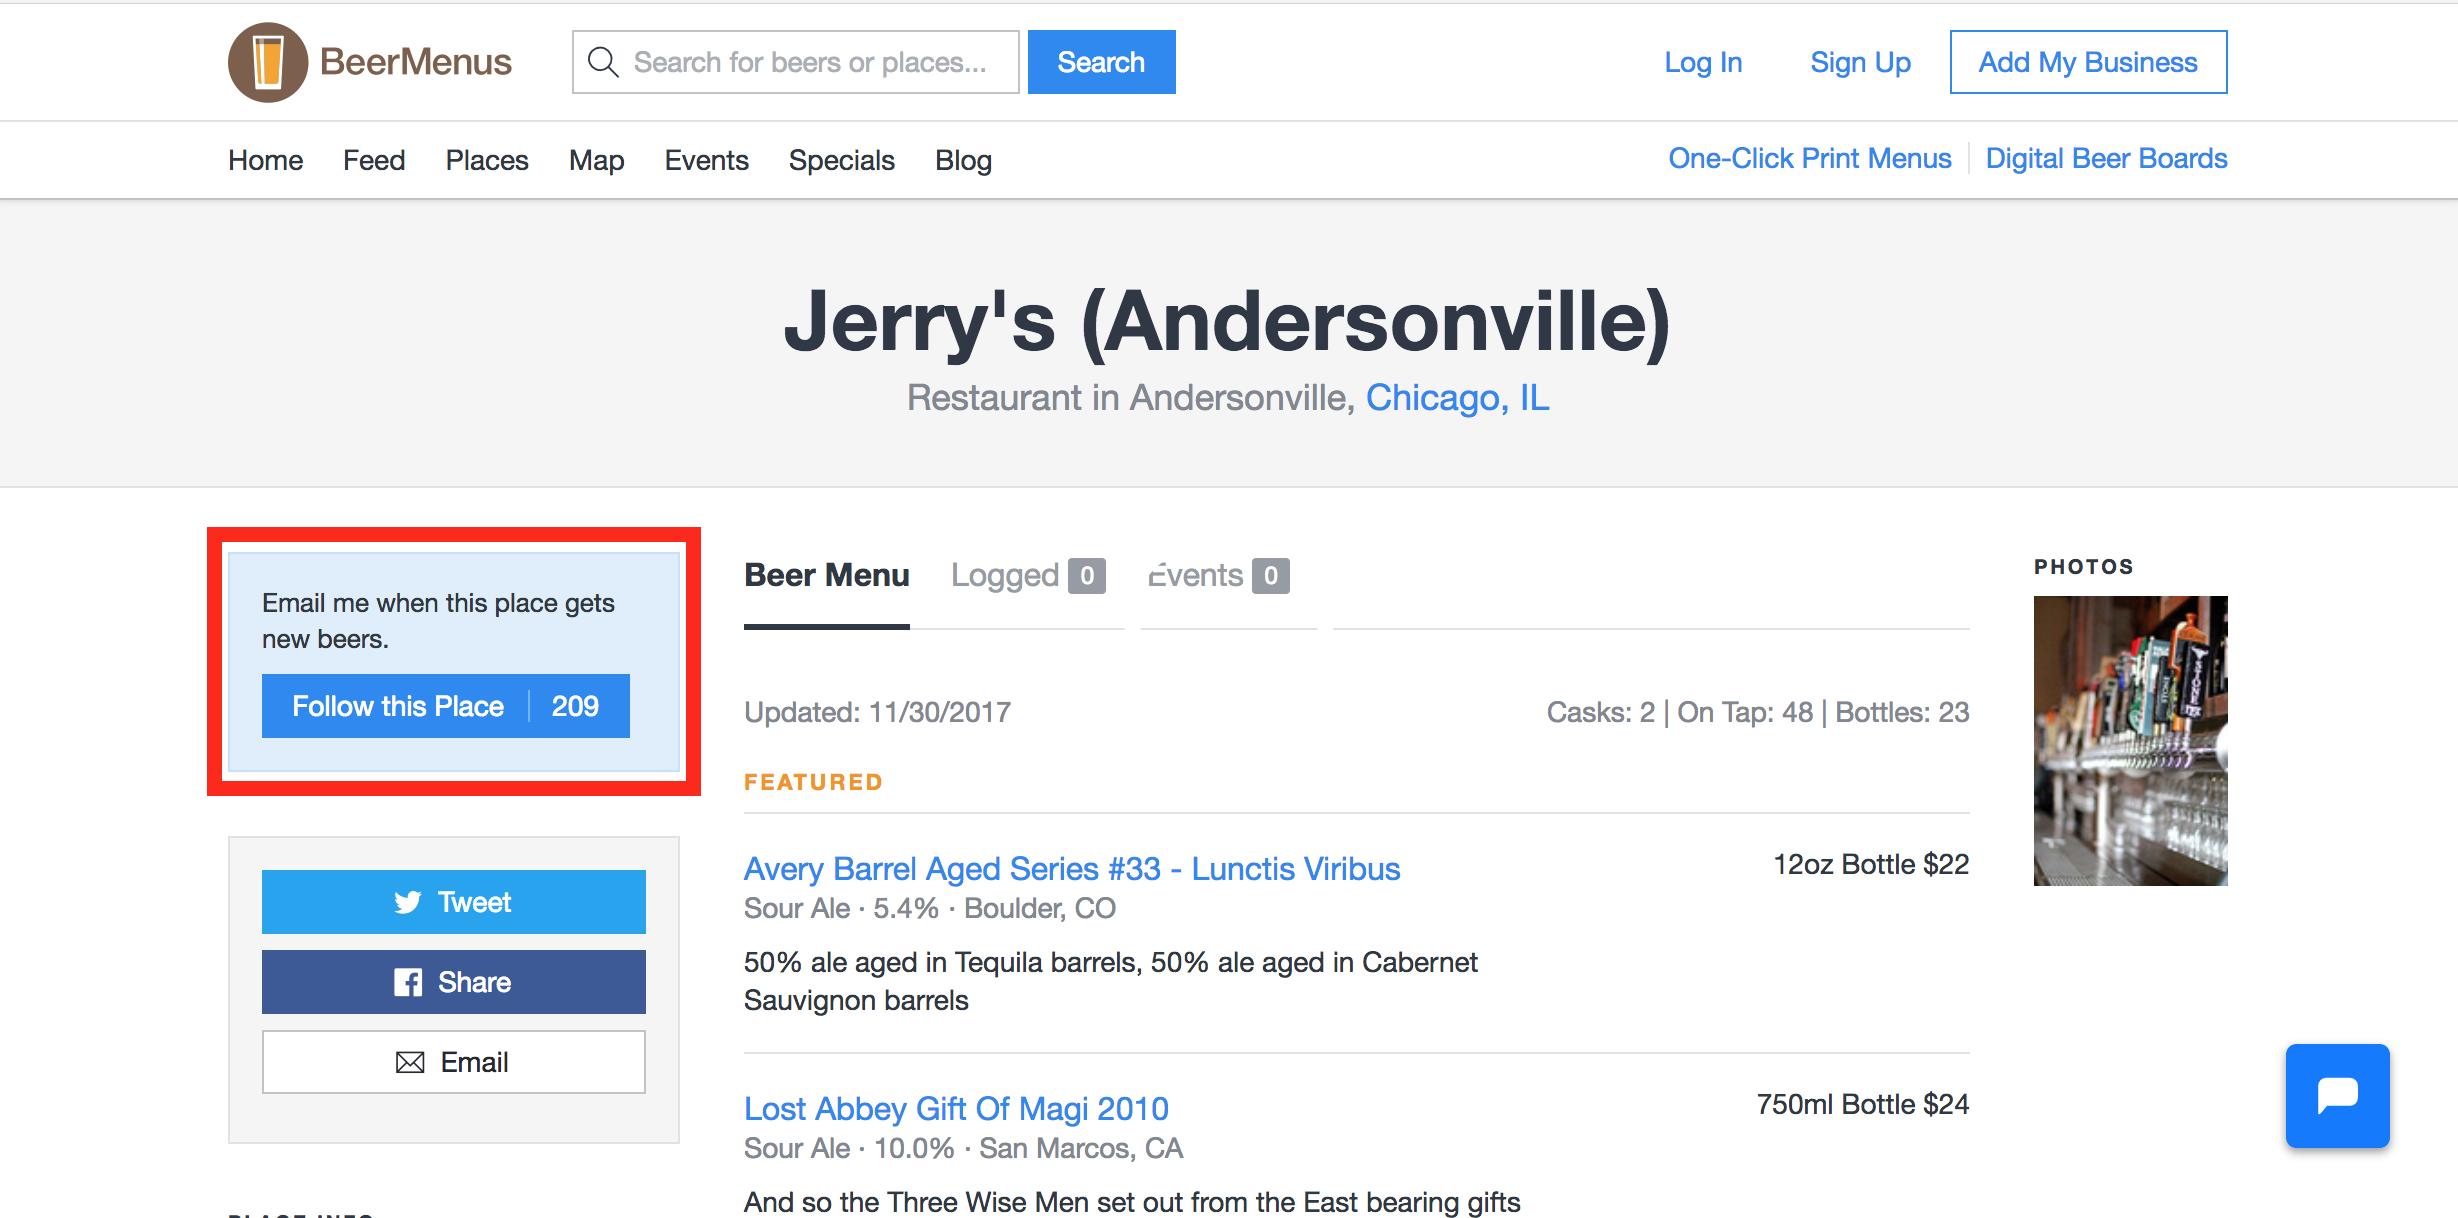 Updating Your Menu to Bring In Followers - BeerMenus Help Center